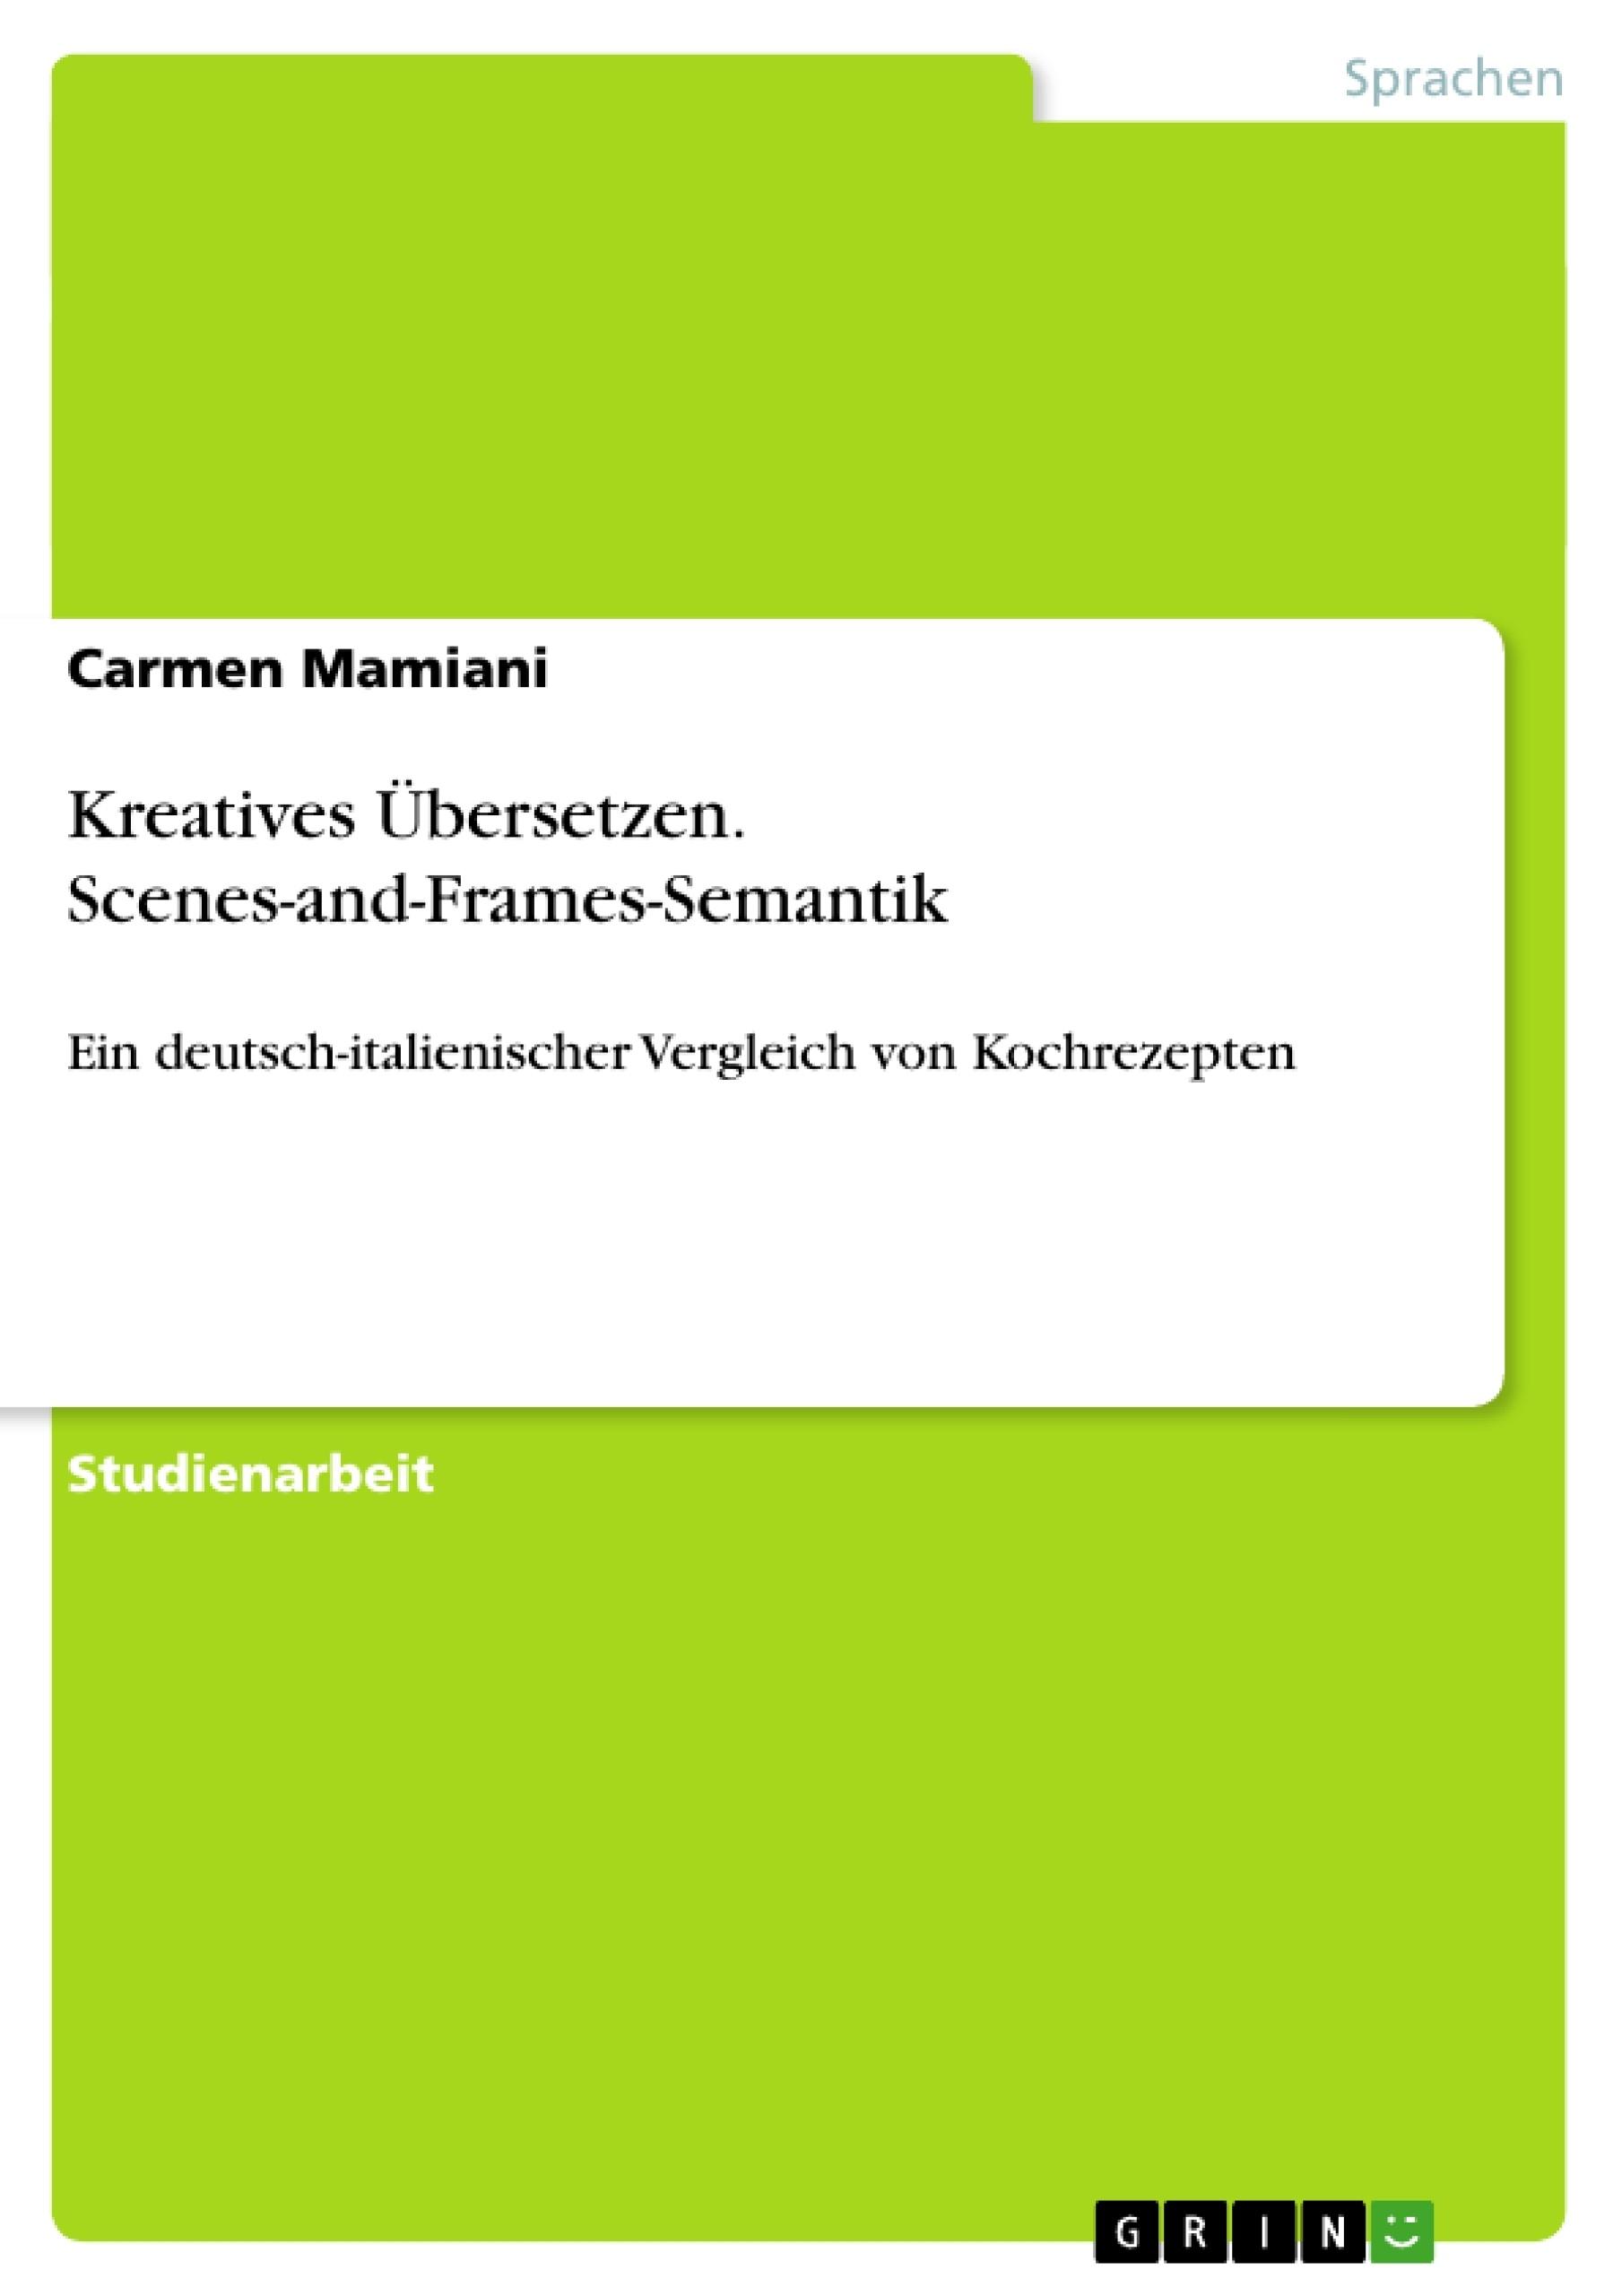 Titel: Kreatives Übersetzen. Scenes-and-Frames-Semantik